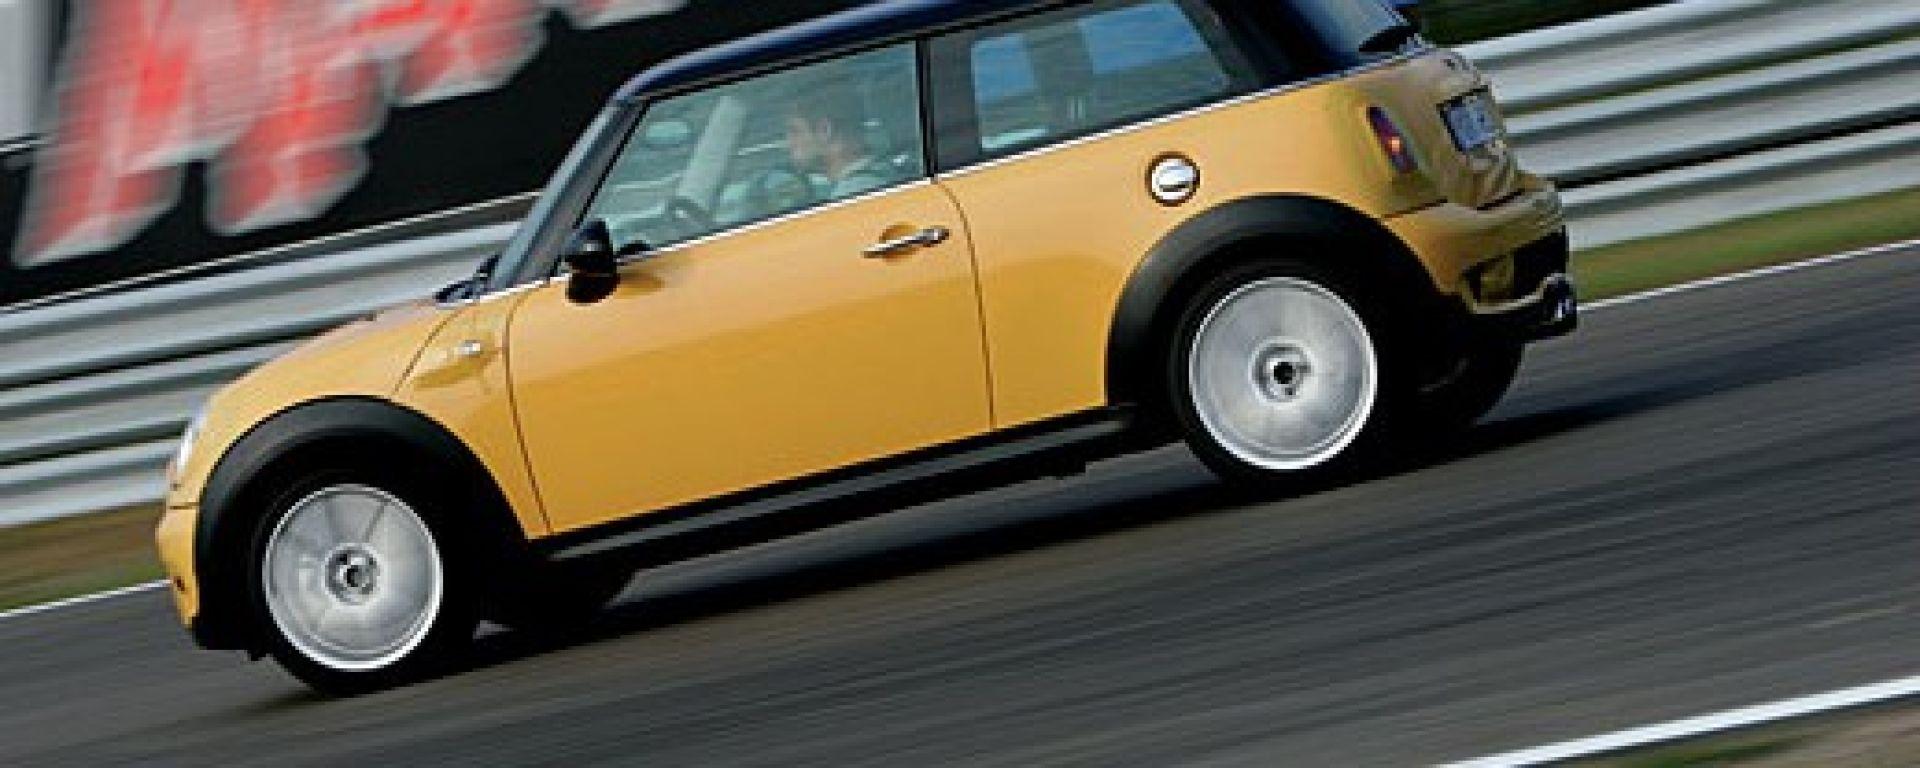 Fiat-Bmw: il nuovo asse italo-tedesco